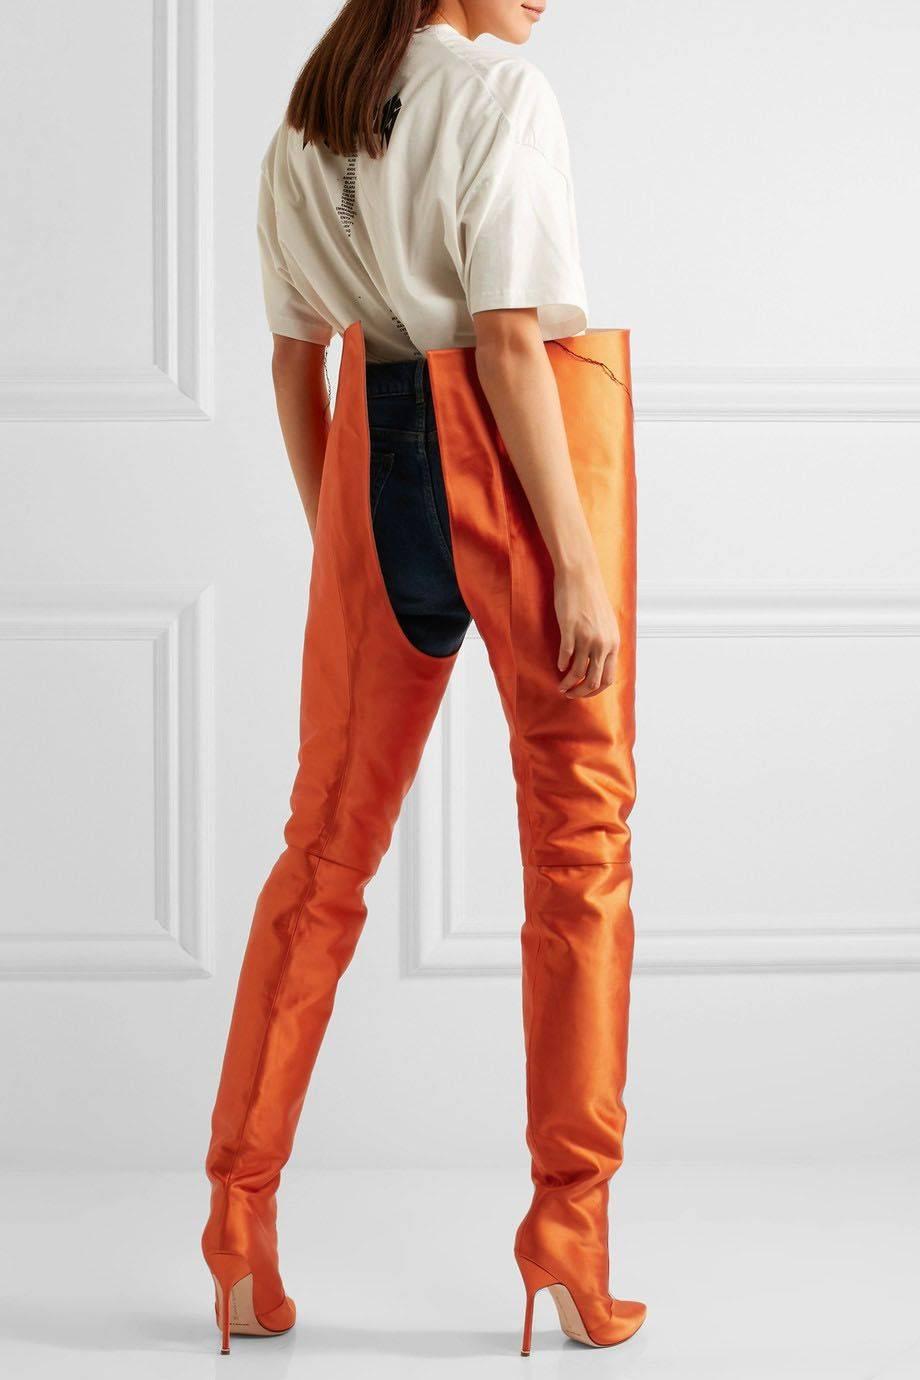 V 234 Tements X Manolo Blahnik Satin Thigh High Boots Senatus